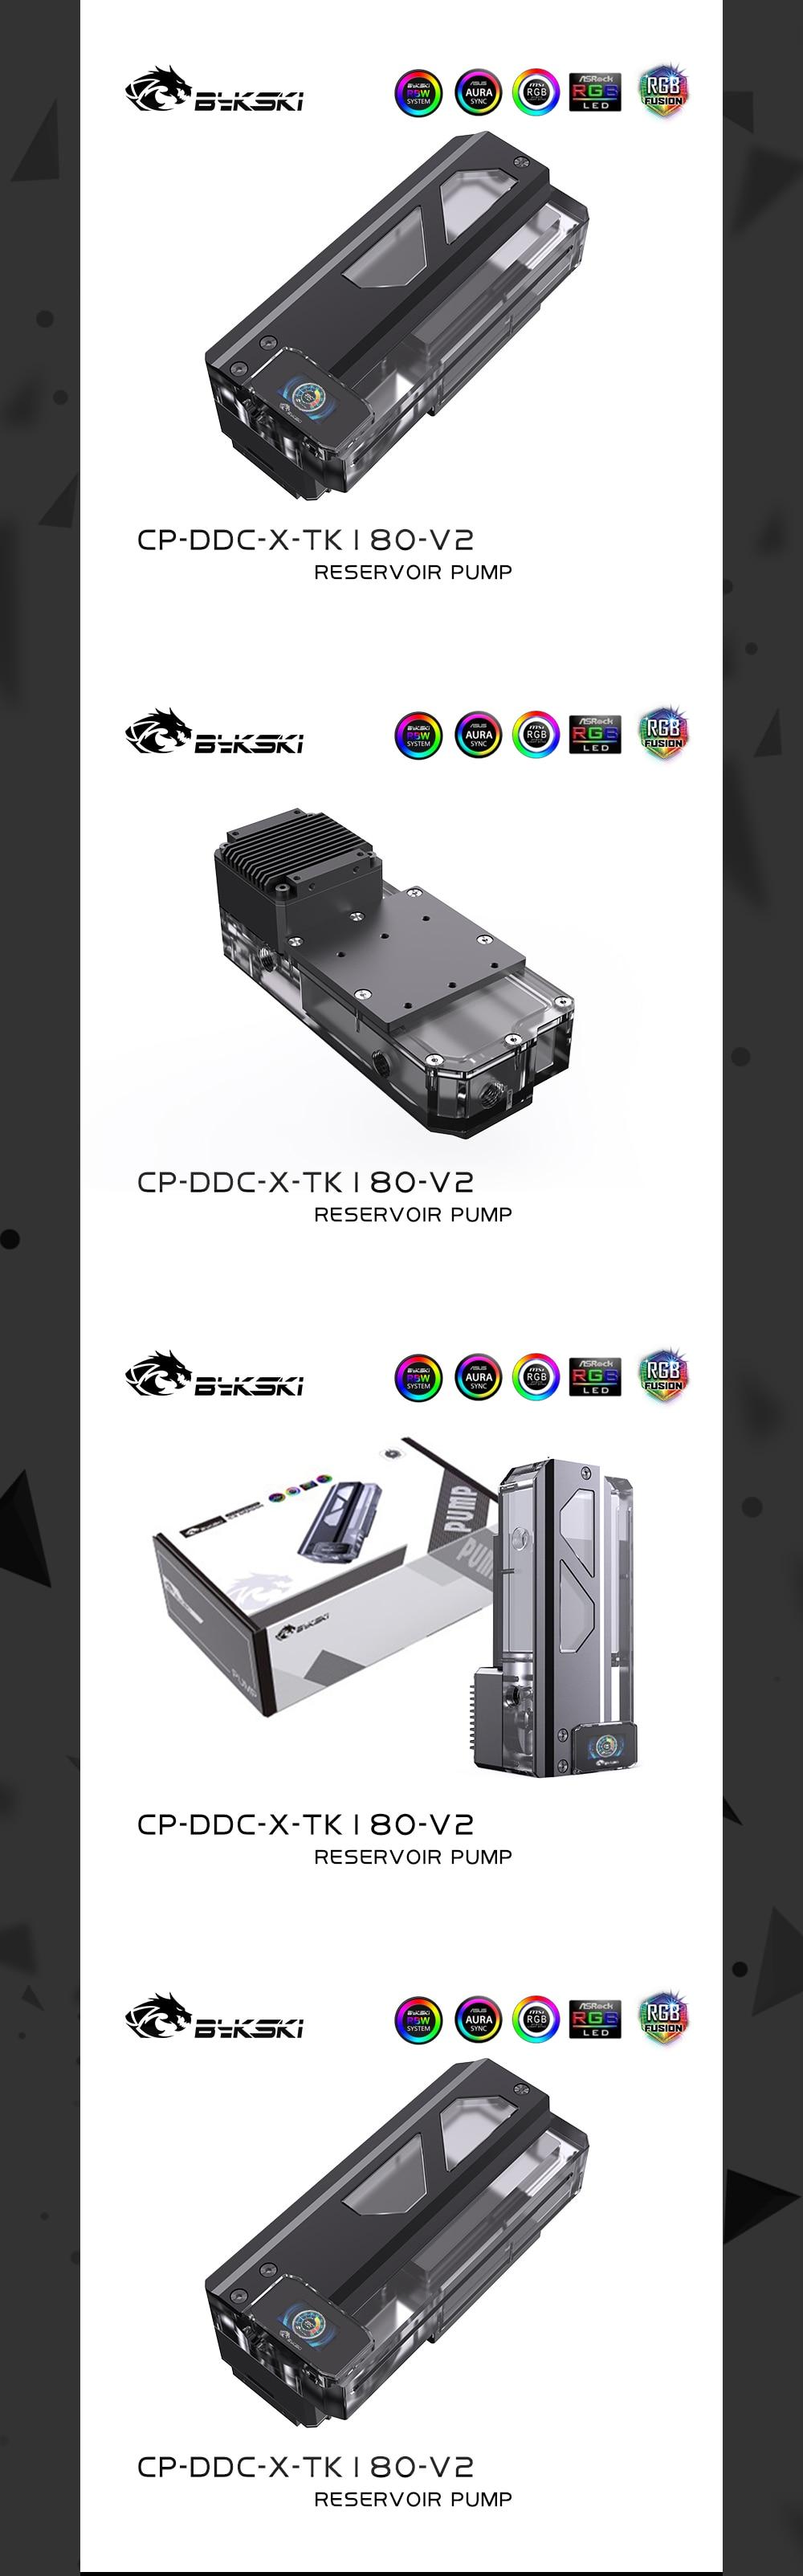 Bykski Square Pump Reservoirs, Matte Acrylic Pump-Reservoir Combination, Pump And Water Tank, CP-DDC-X-TK180-V2/CP-DDC-X-TK220-V2